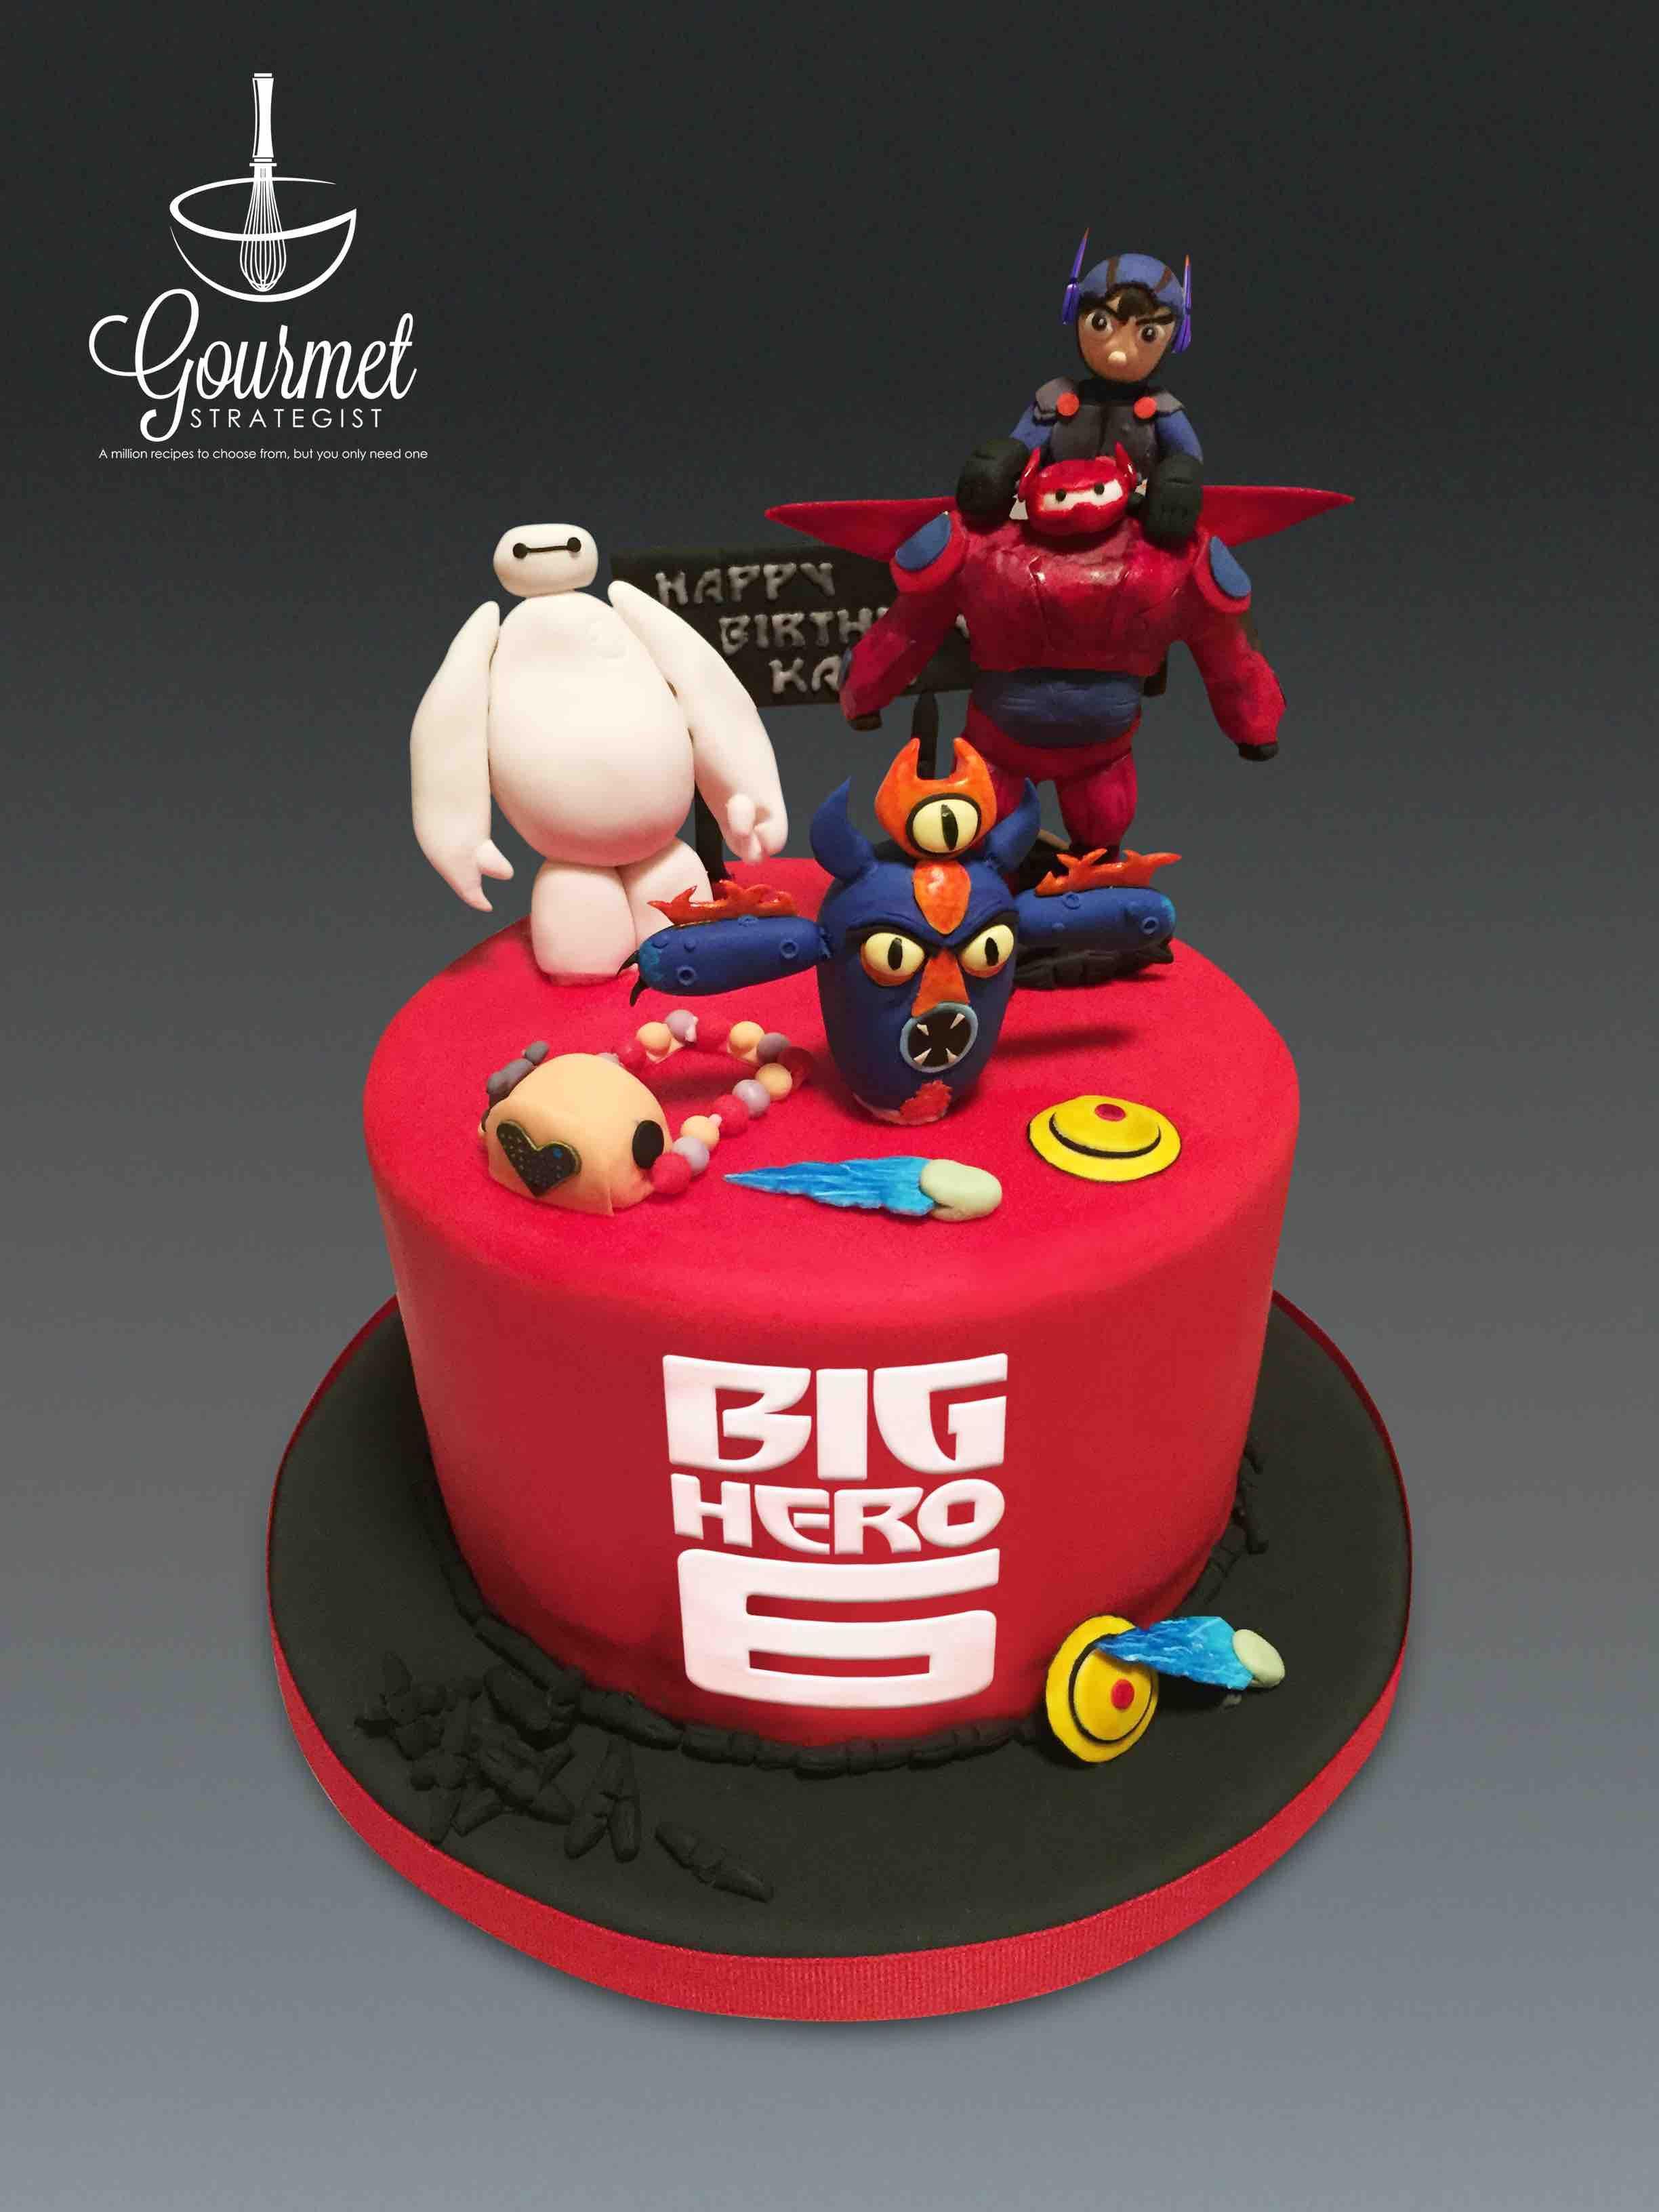 Big Hero 6 Theme Birthday Cake With Images 6th Birthday Cakes